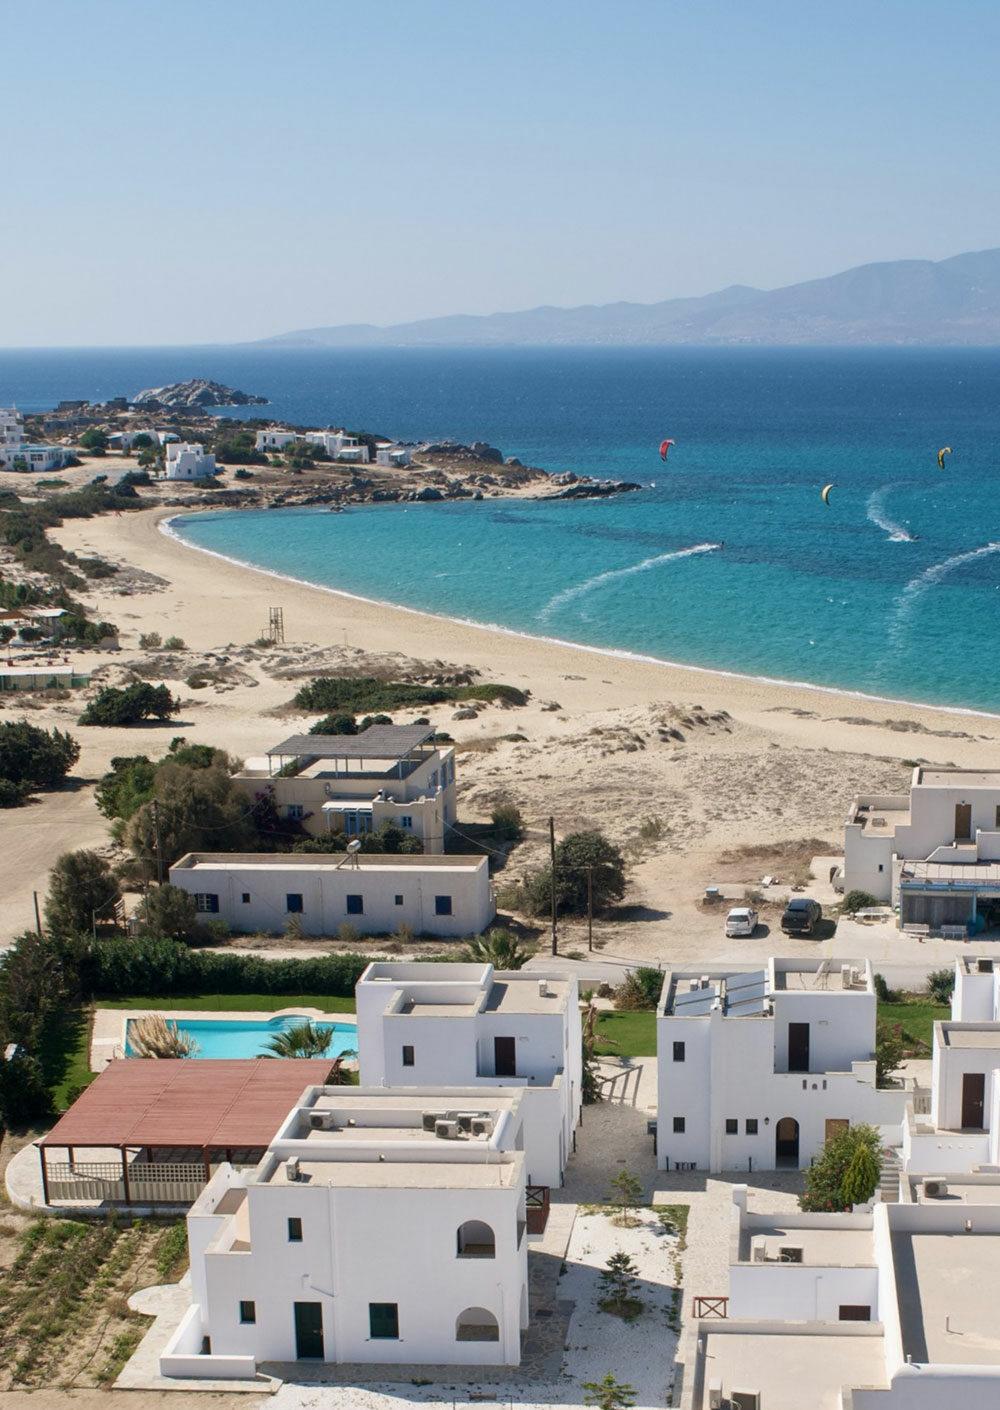 kite hotel naxos greece fllisvos sportclub